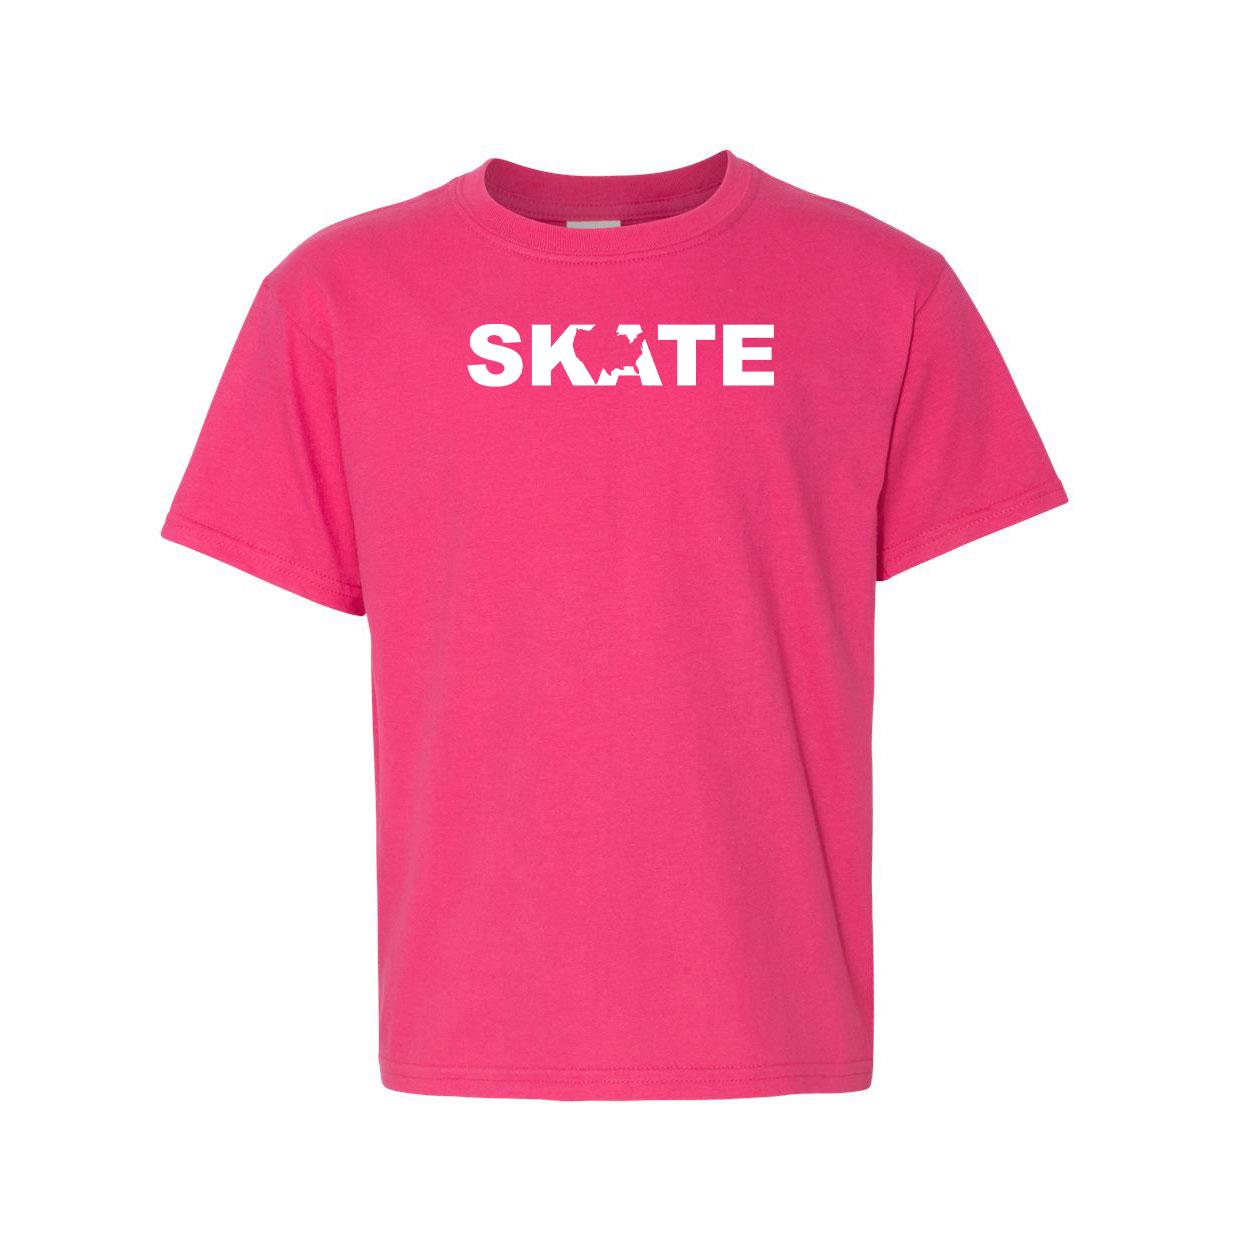 Skate United States Classic Youth T-Shirt Pink (White Logo)